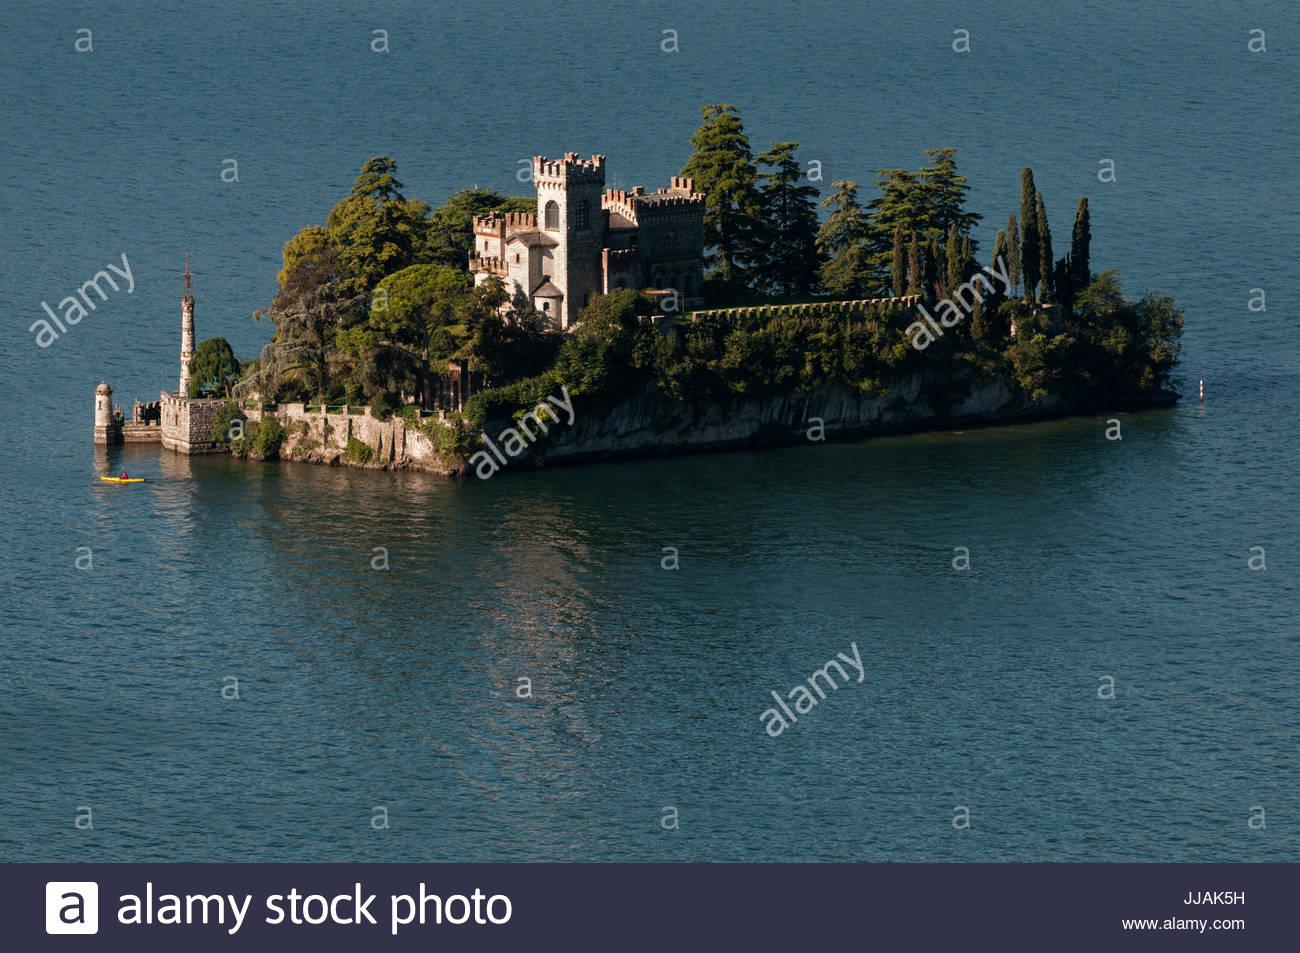 Isola di Loreto summer view, Lake Iseo, Lombardy - Stock Image